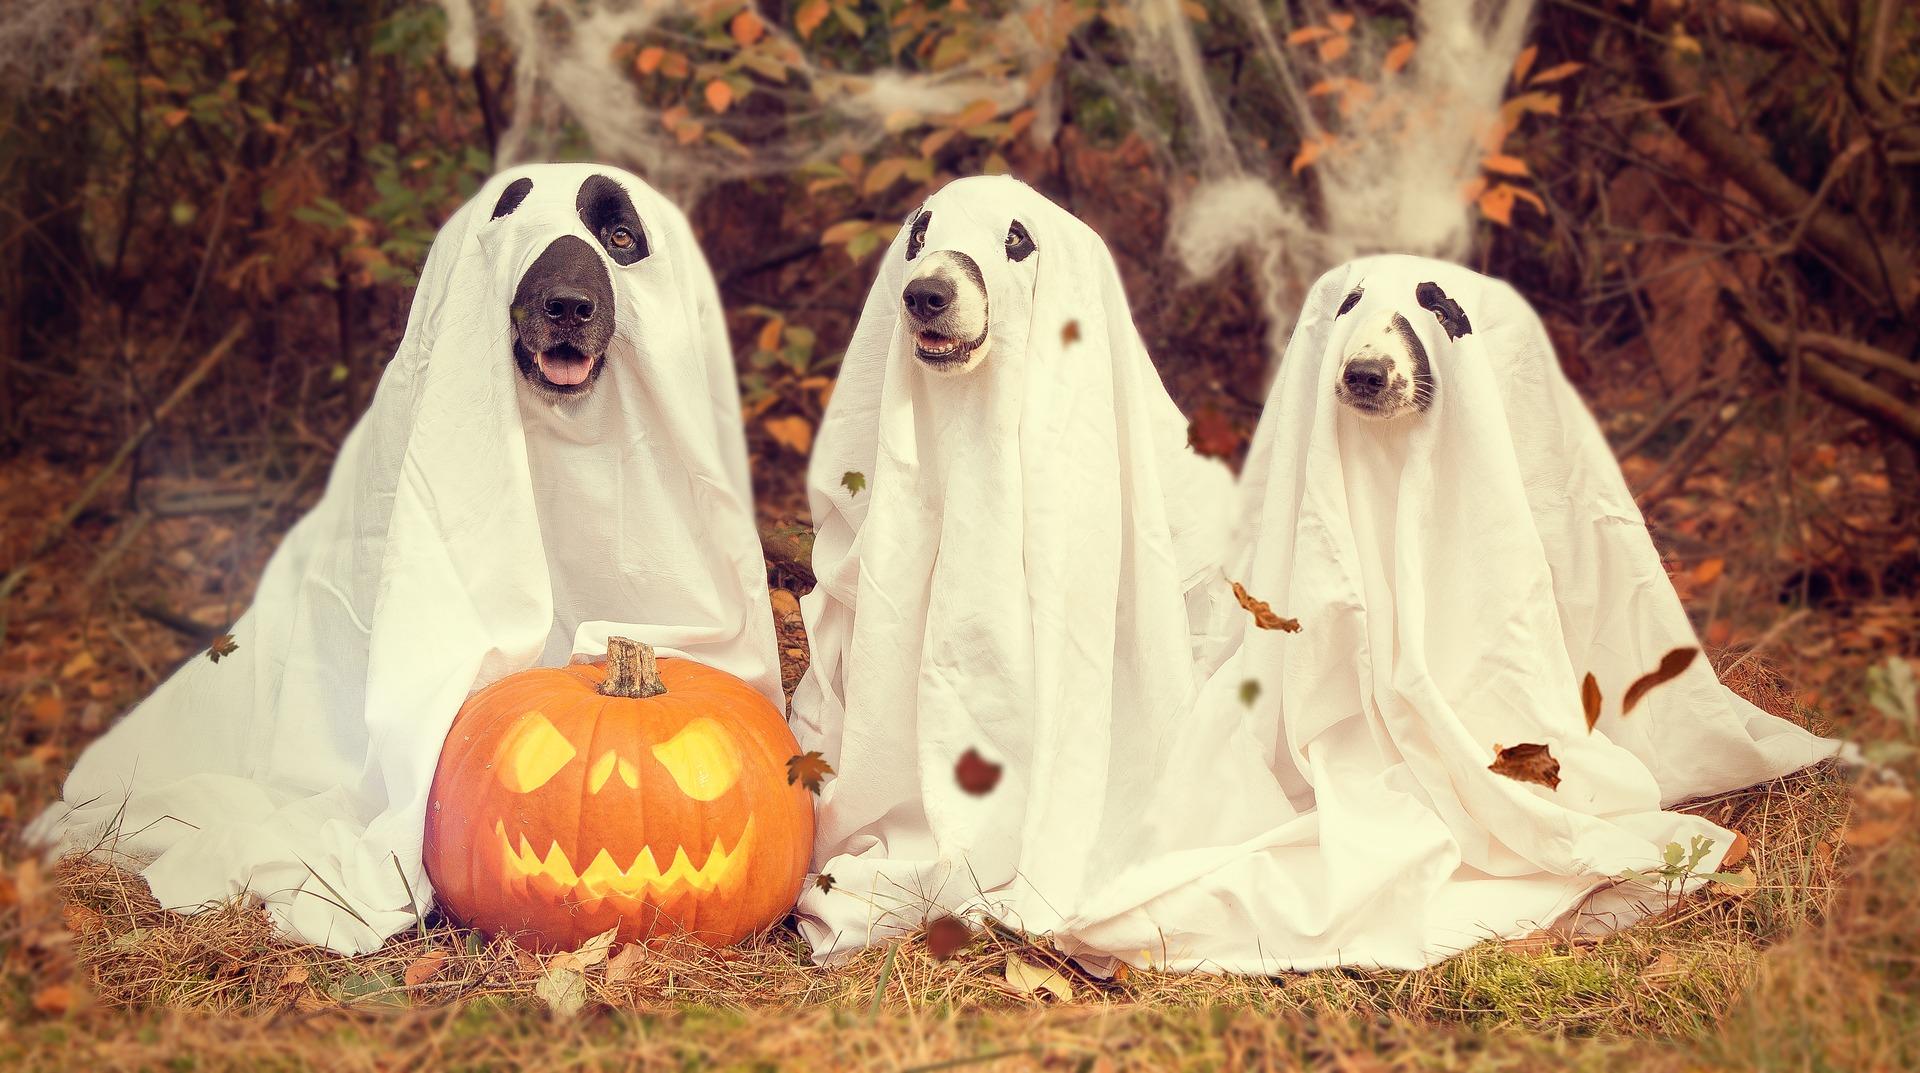 halloween-2870607_1920 (1).jpg